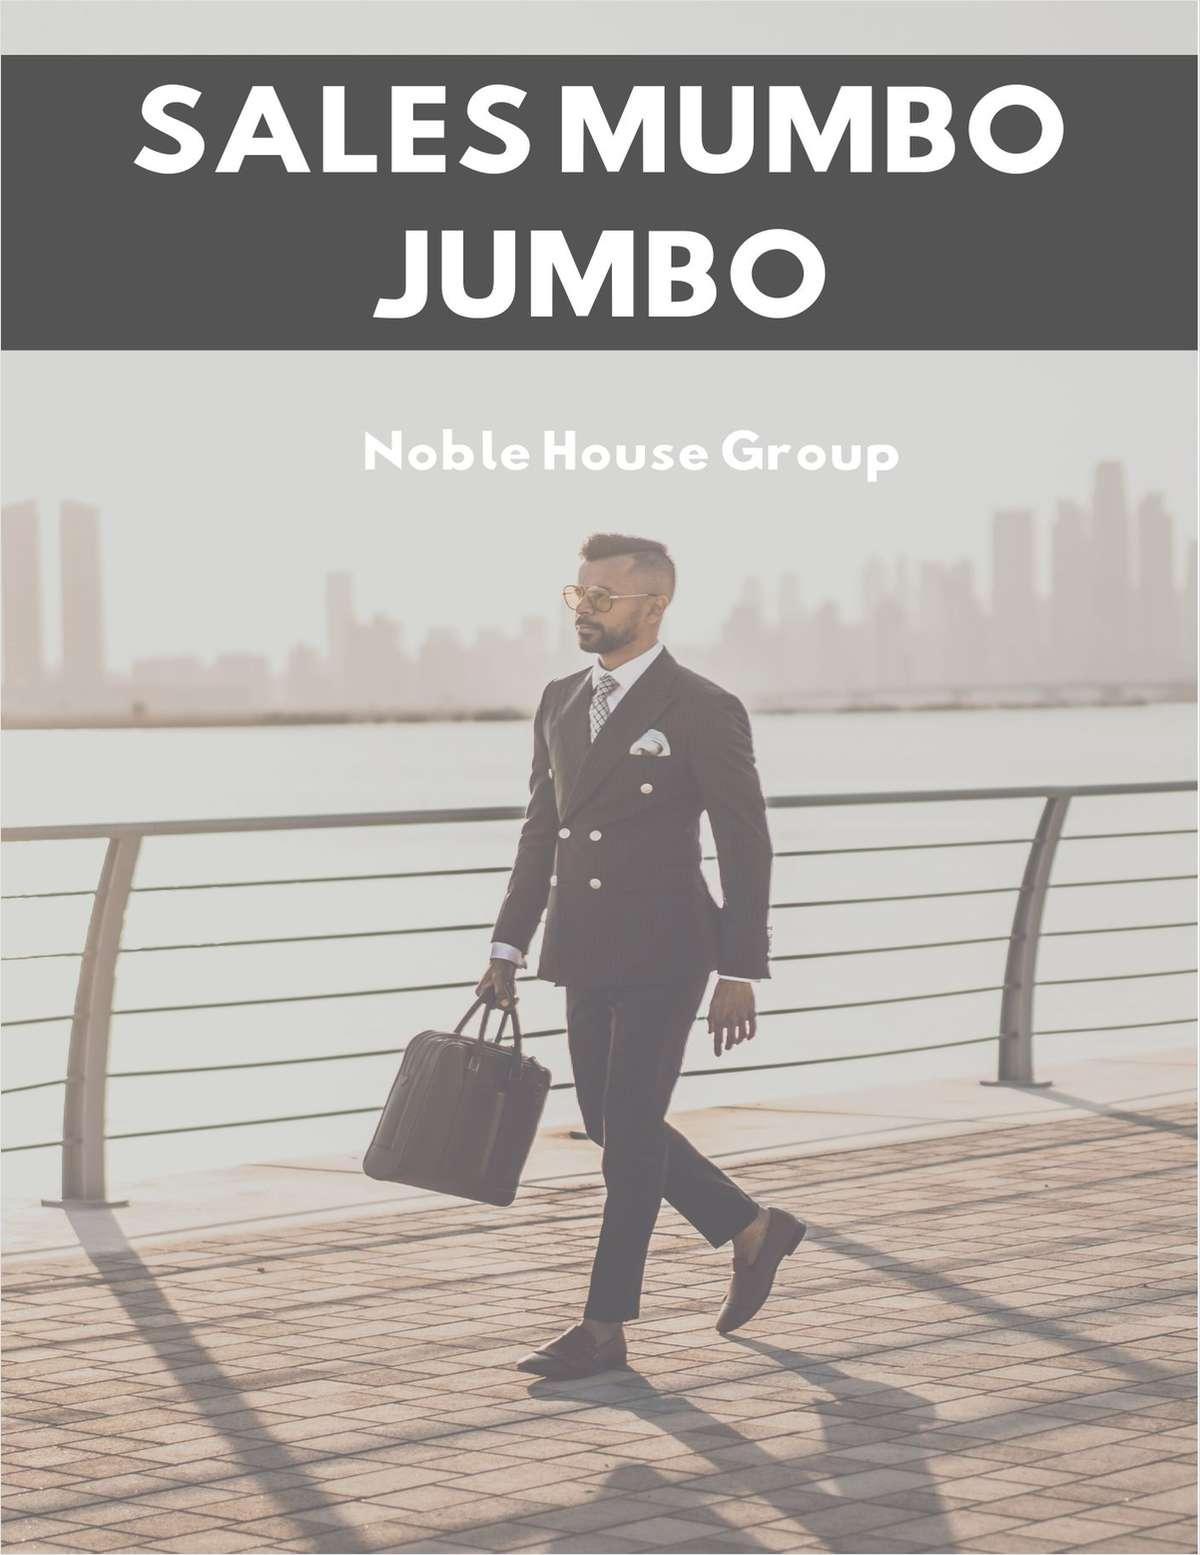 Sales Mumbo Jumbo